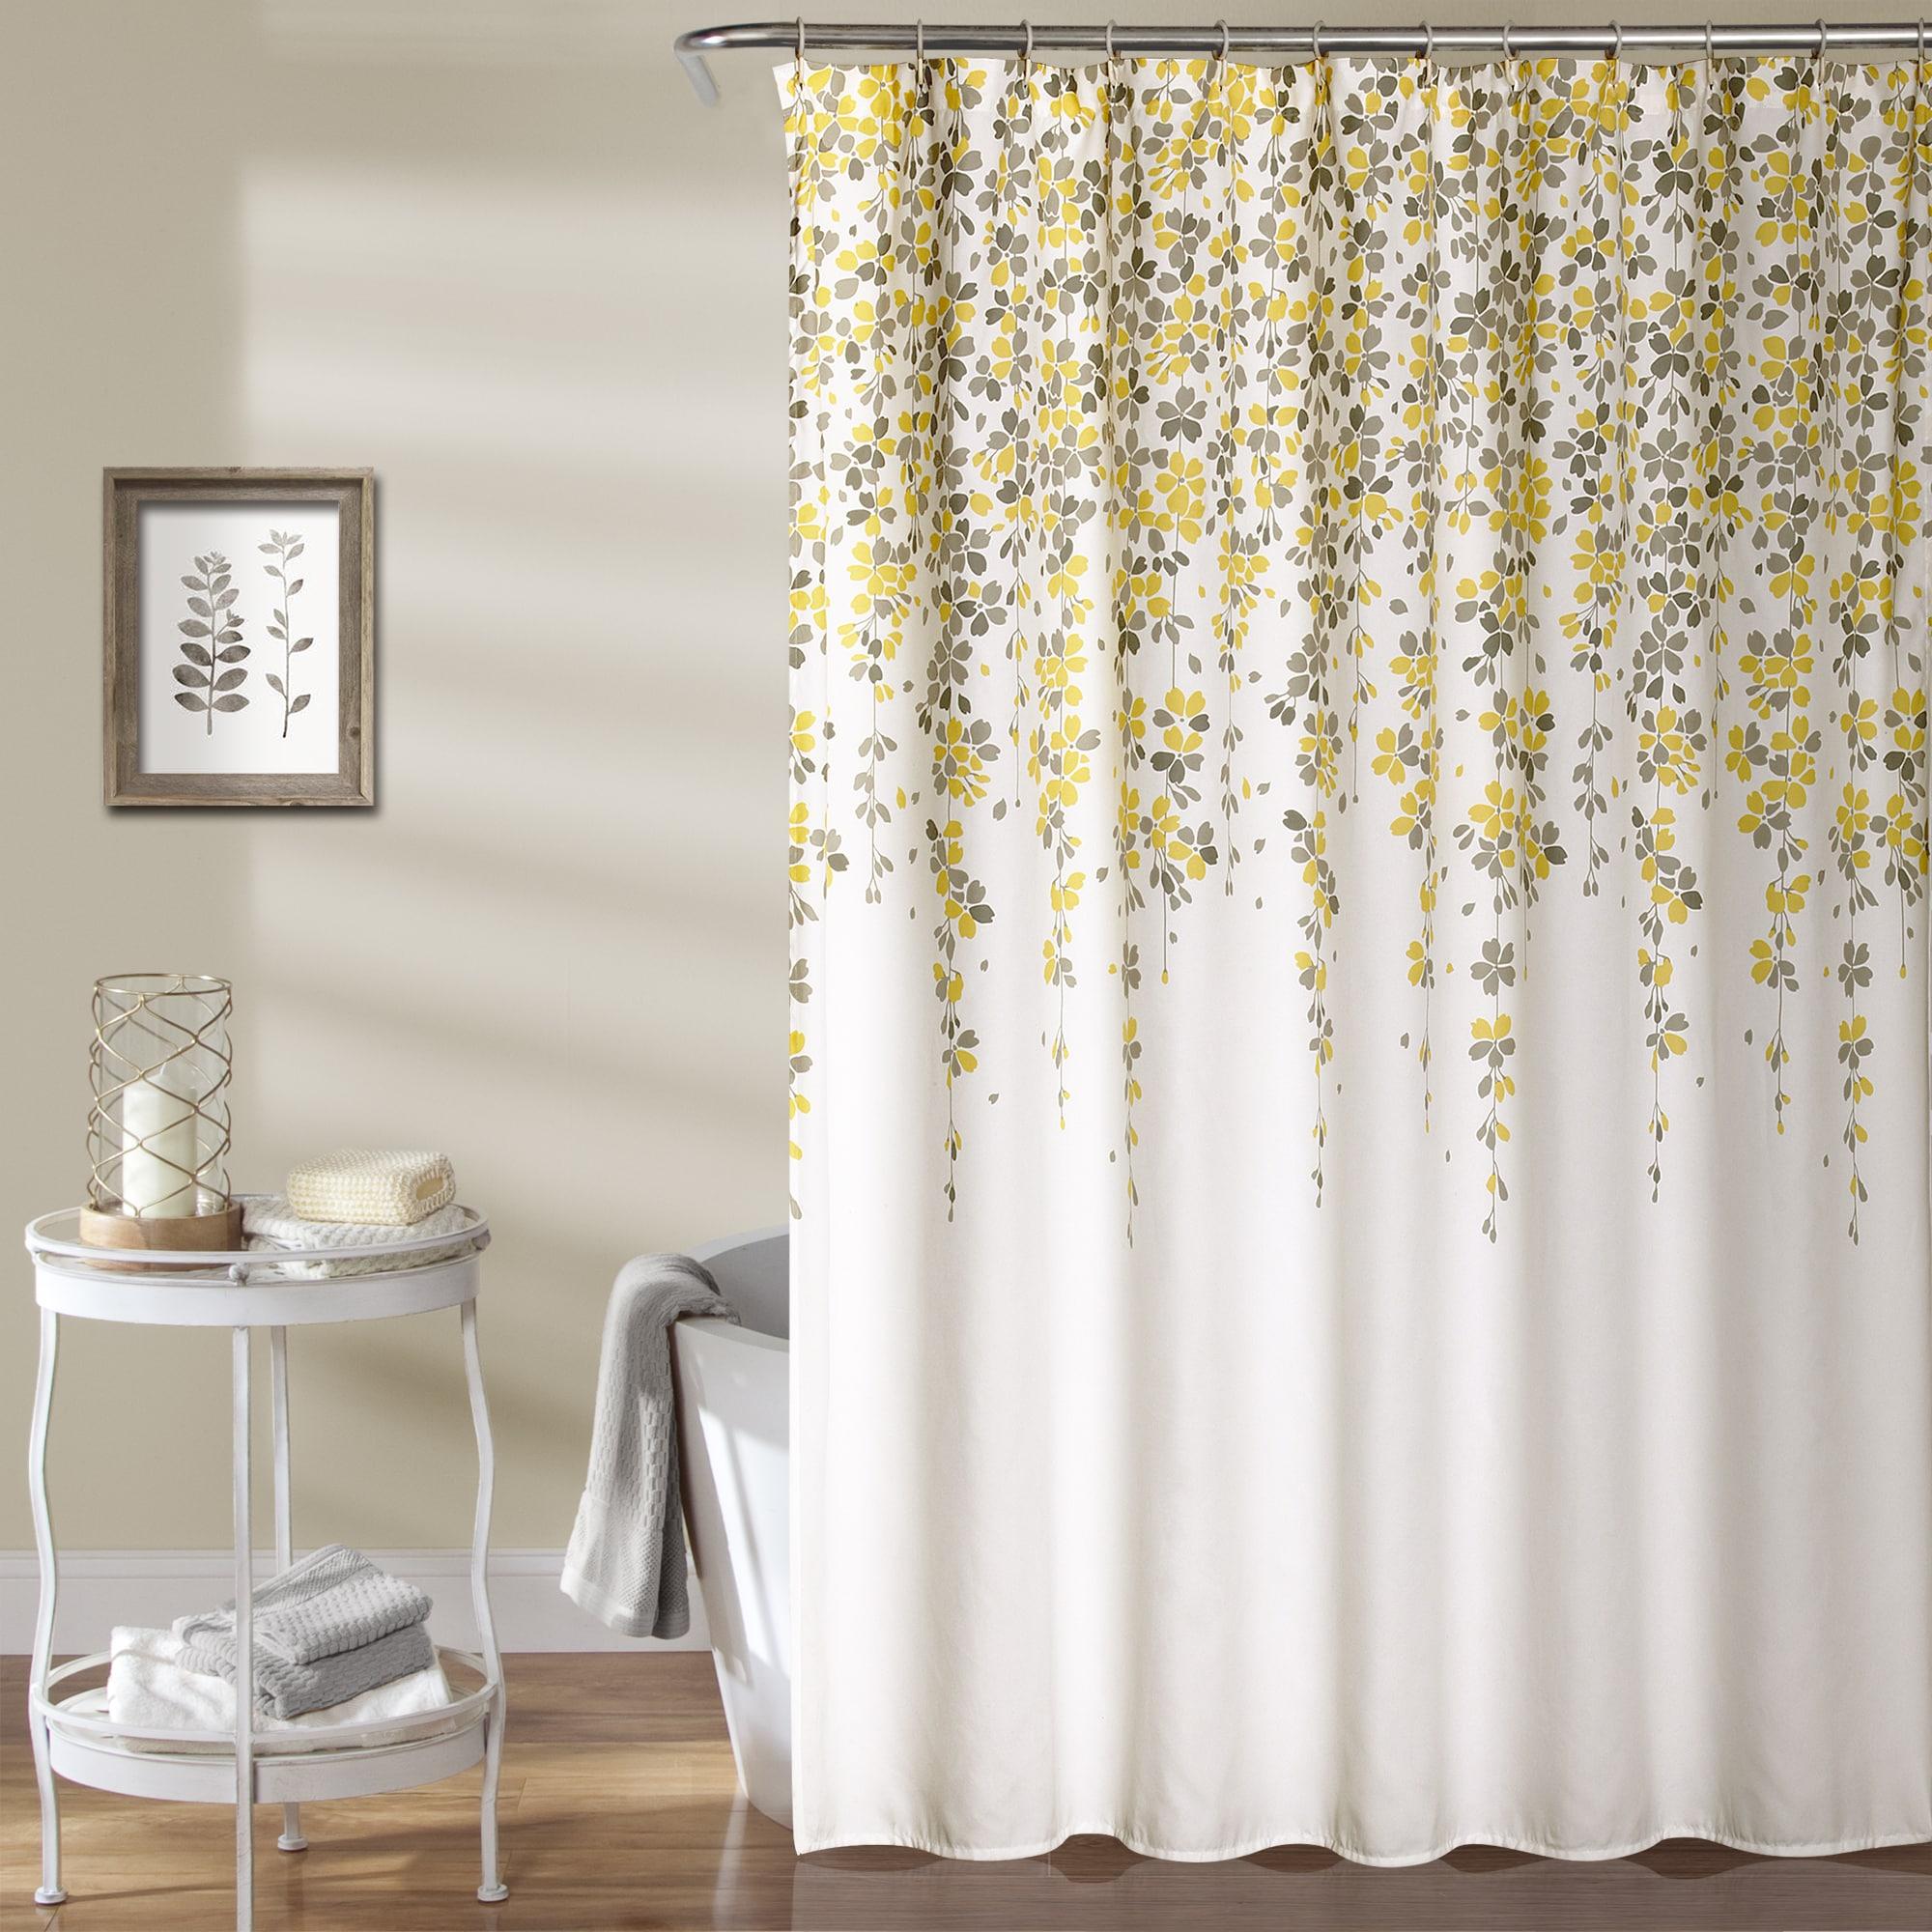 "Lush Decor Weeping Flower Shower Curtain (72"" x 72"", Yell..."